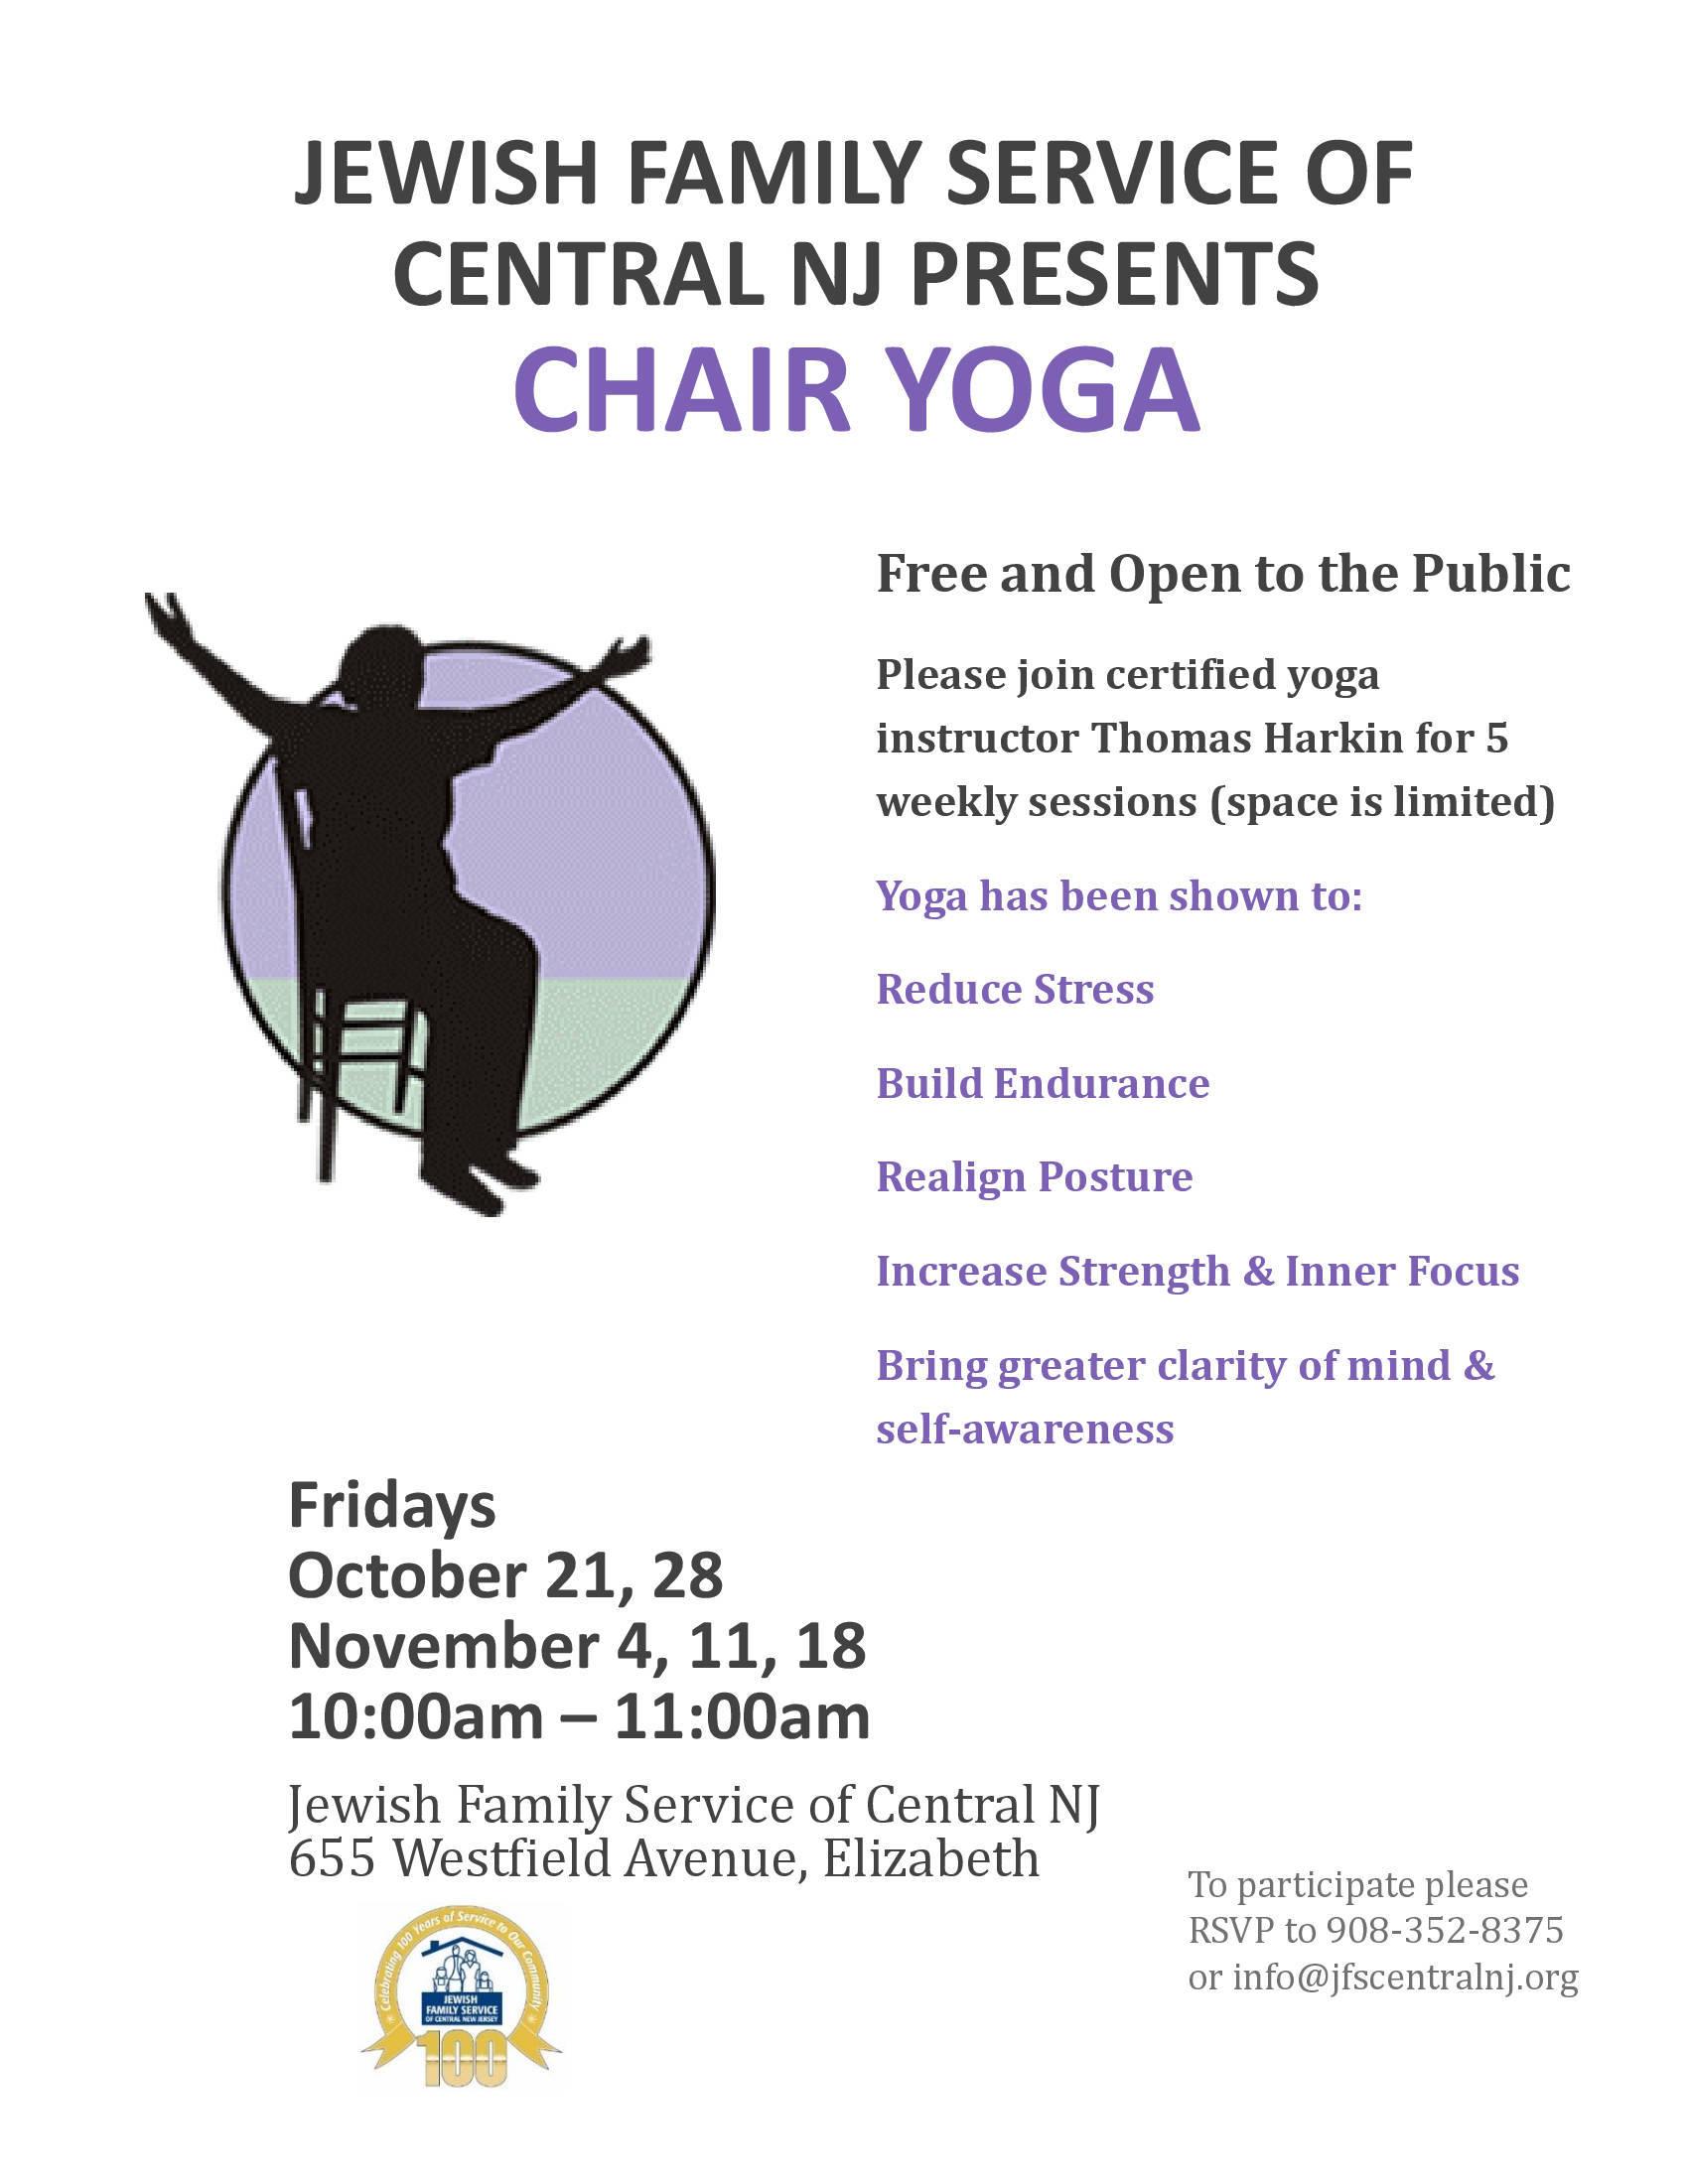 FREE Chair Yoga Classes Elizabeth NJ News TAPinto